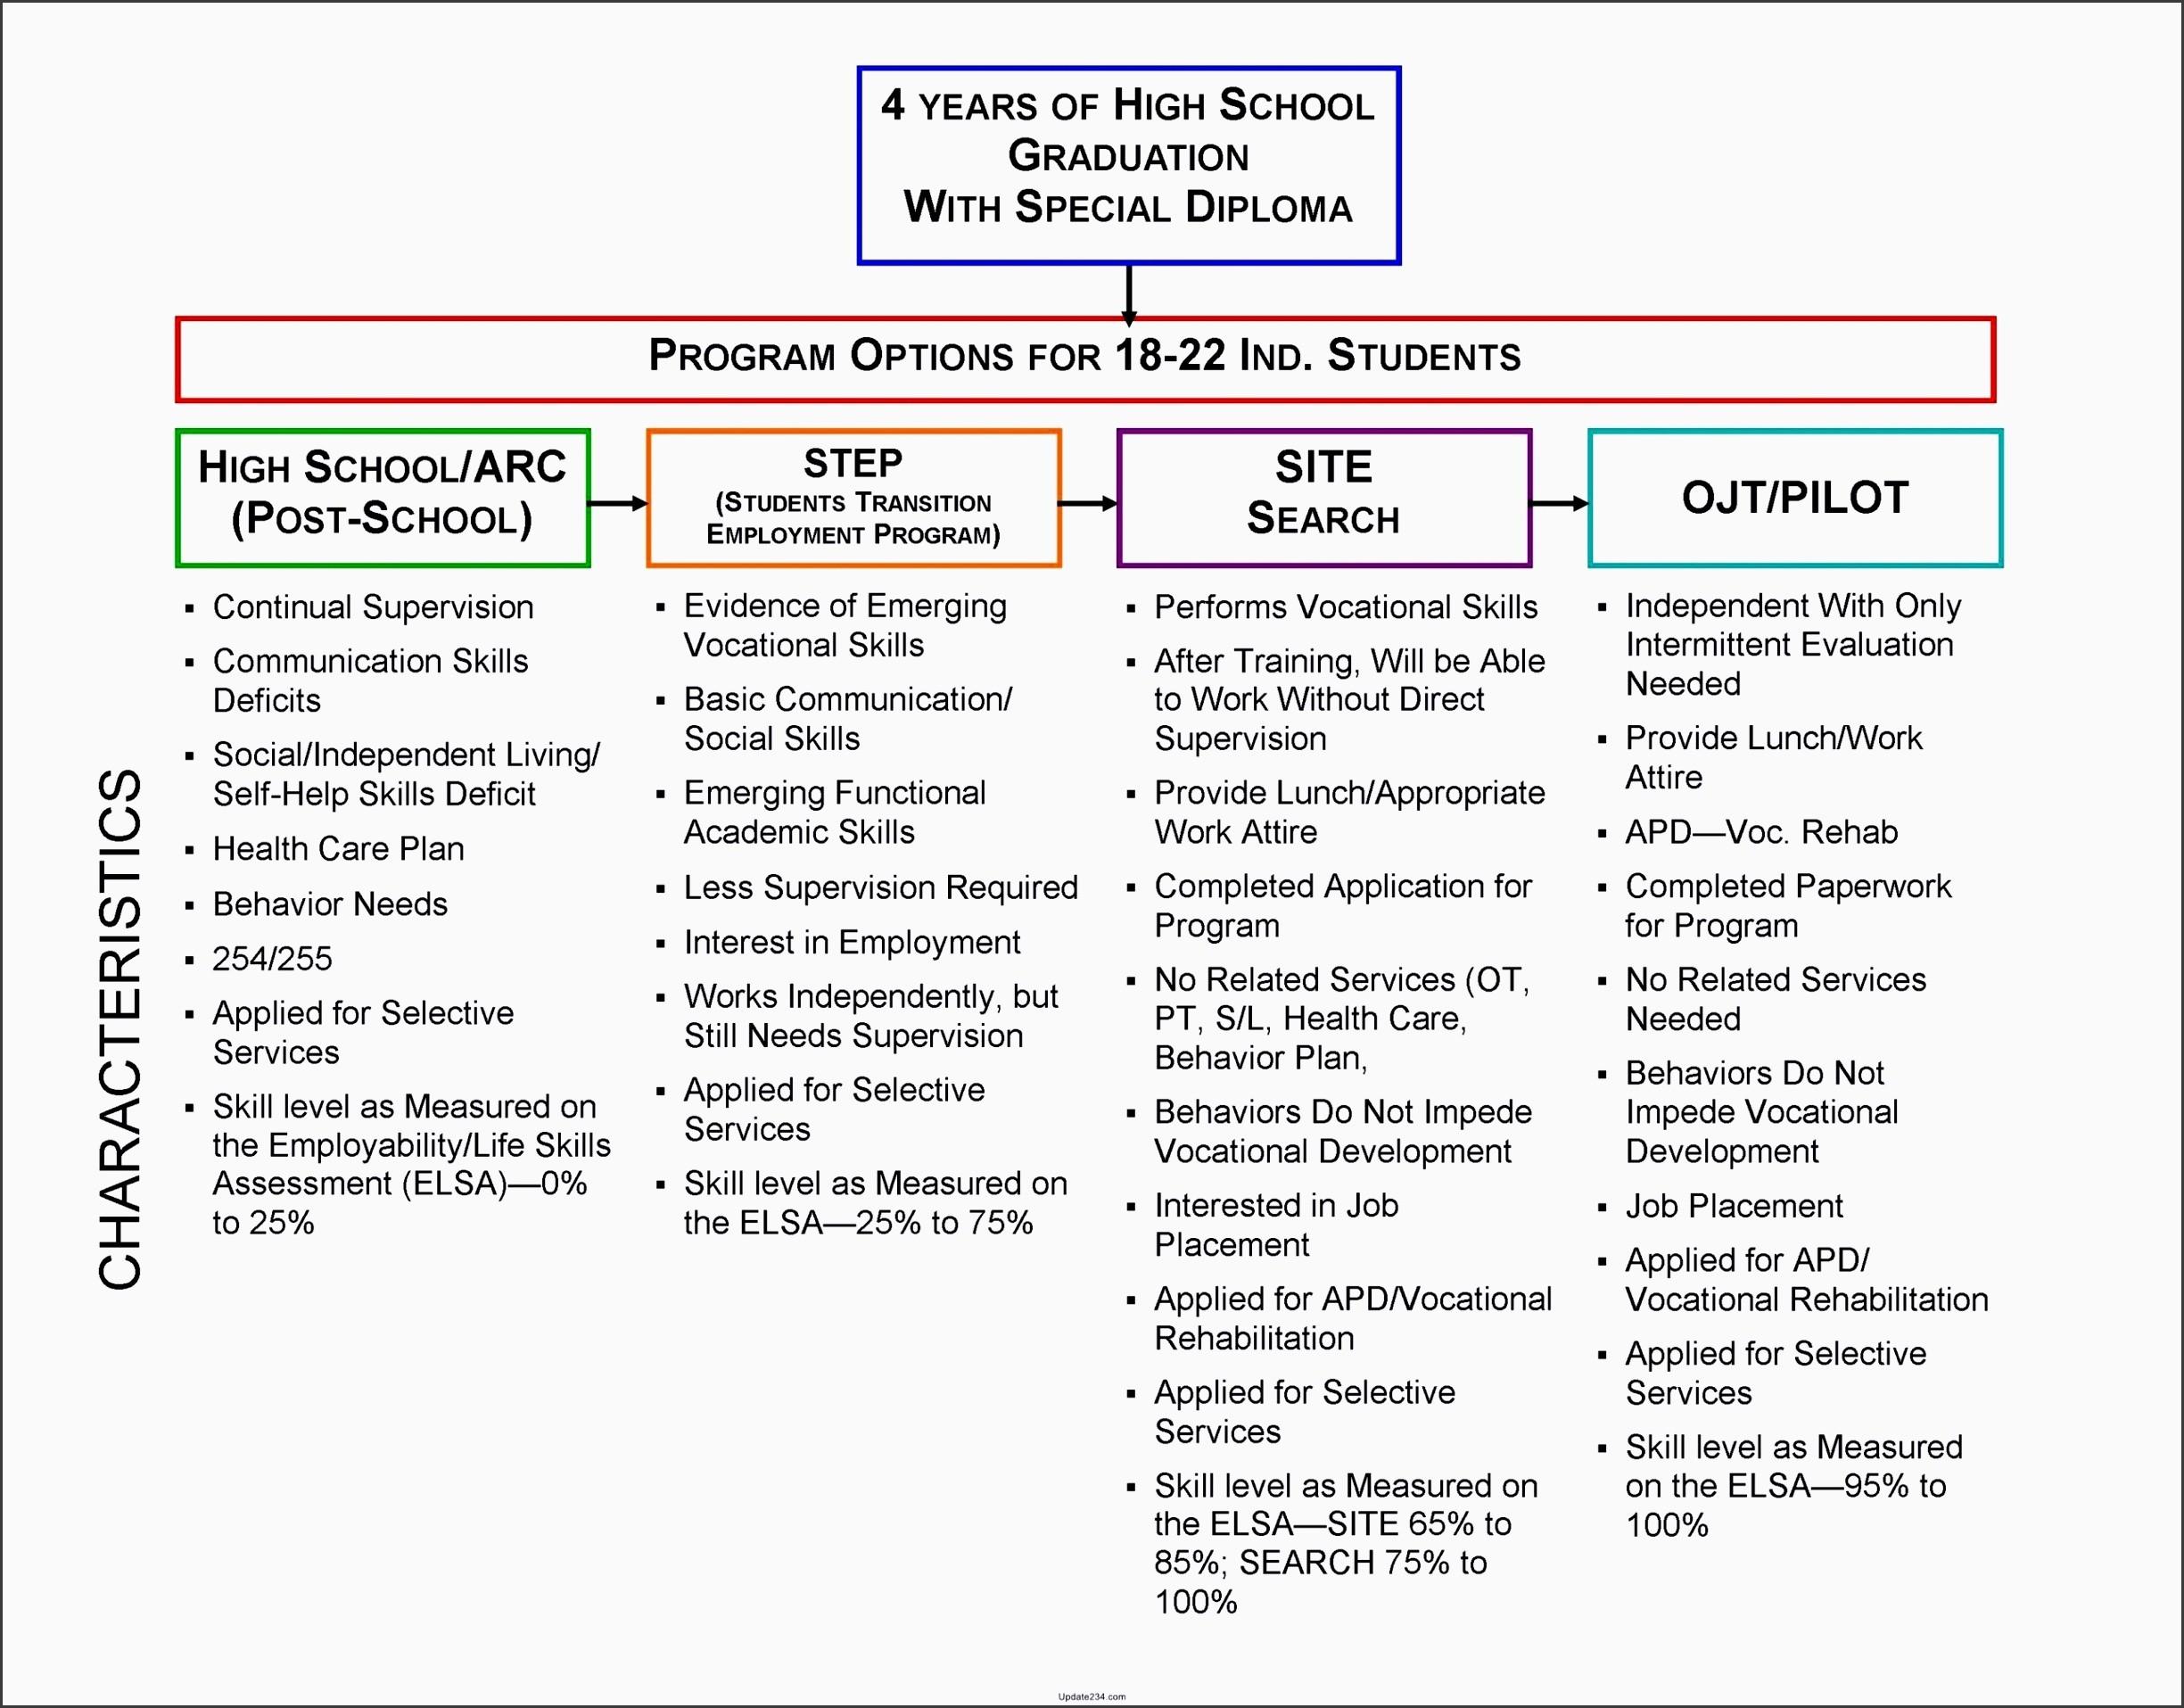 career 5 year plan template  7 Career Planning Checklist In Excel - SampleTemplatess ..